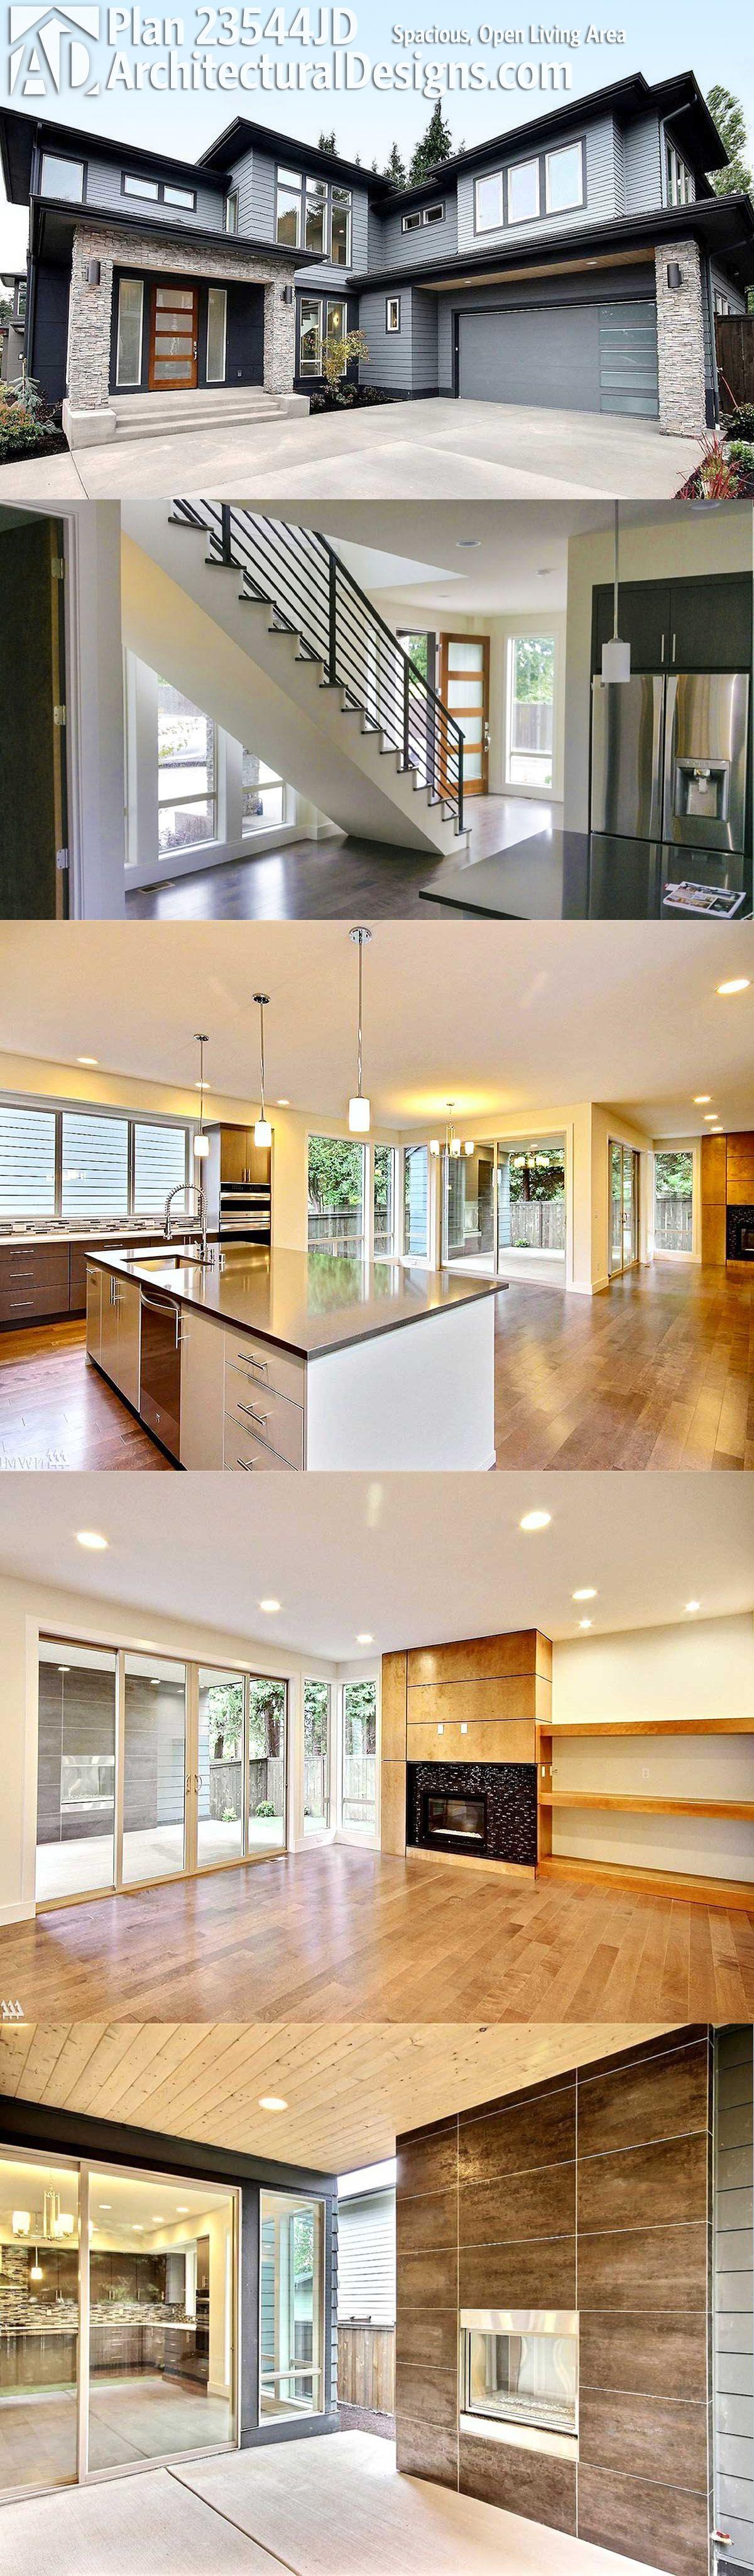 plan 23544jd spacious open living area pinterest modern house